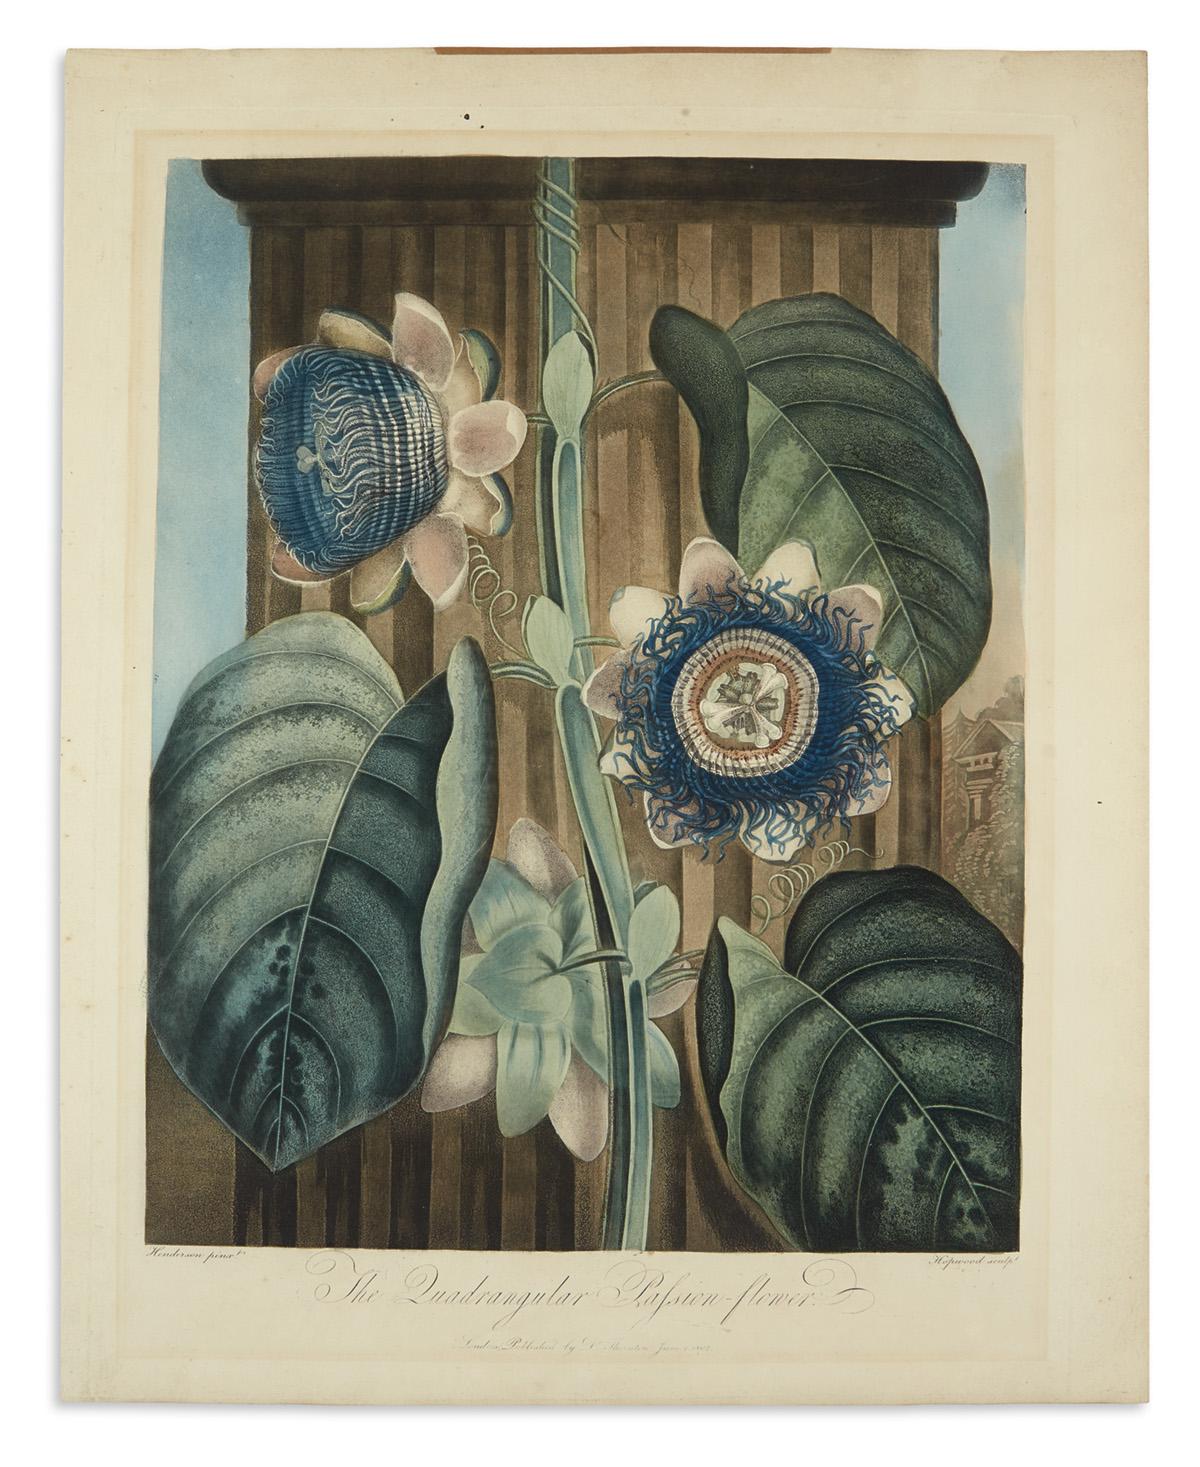 THORNTON-ROBERT-JOHN-The-Quadrangular-Passion-Flower